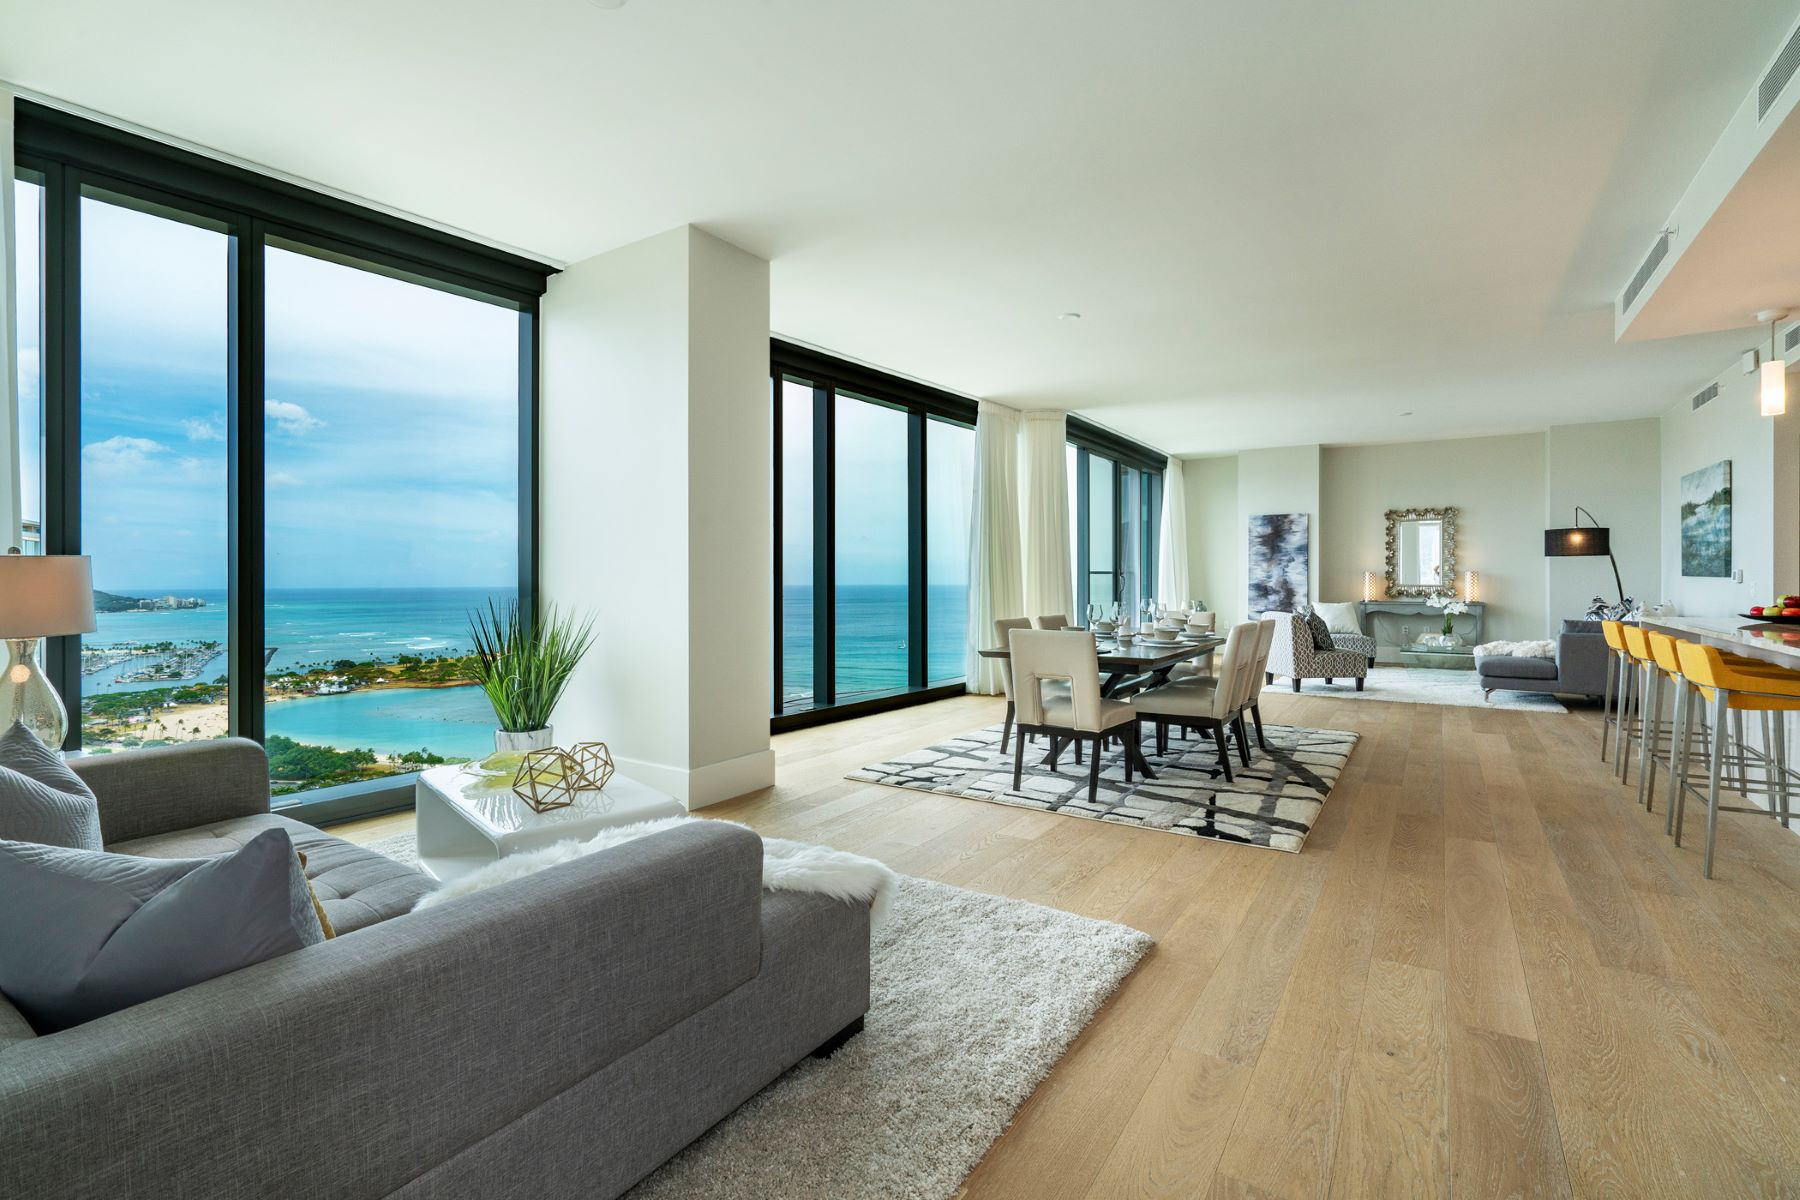 Condominiums για την Πώληση στο High Rise Condo, Luxury Condo, Penthouse, Anaha, Ward Village, Ocean View 1108 Auahi St #PH 3602, Honolulu, Χαβαη 96814 Ηνωμένες Πολιτείες